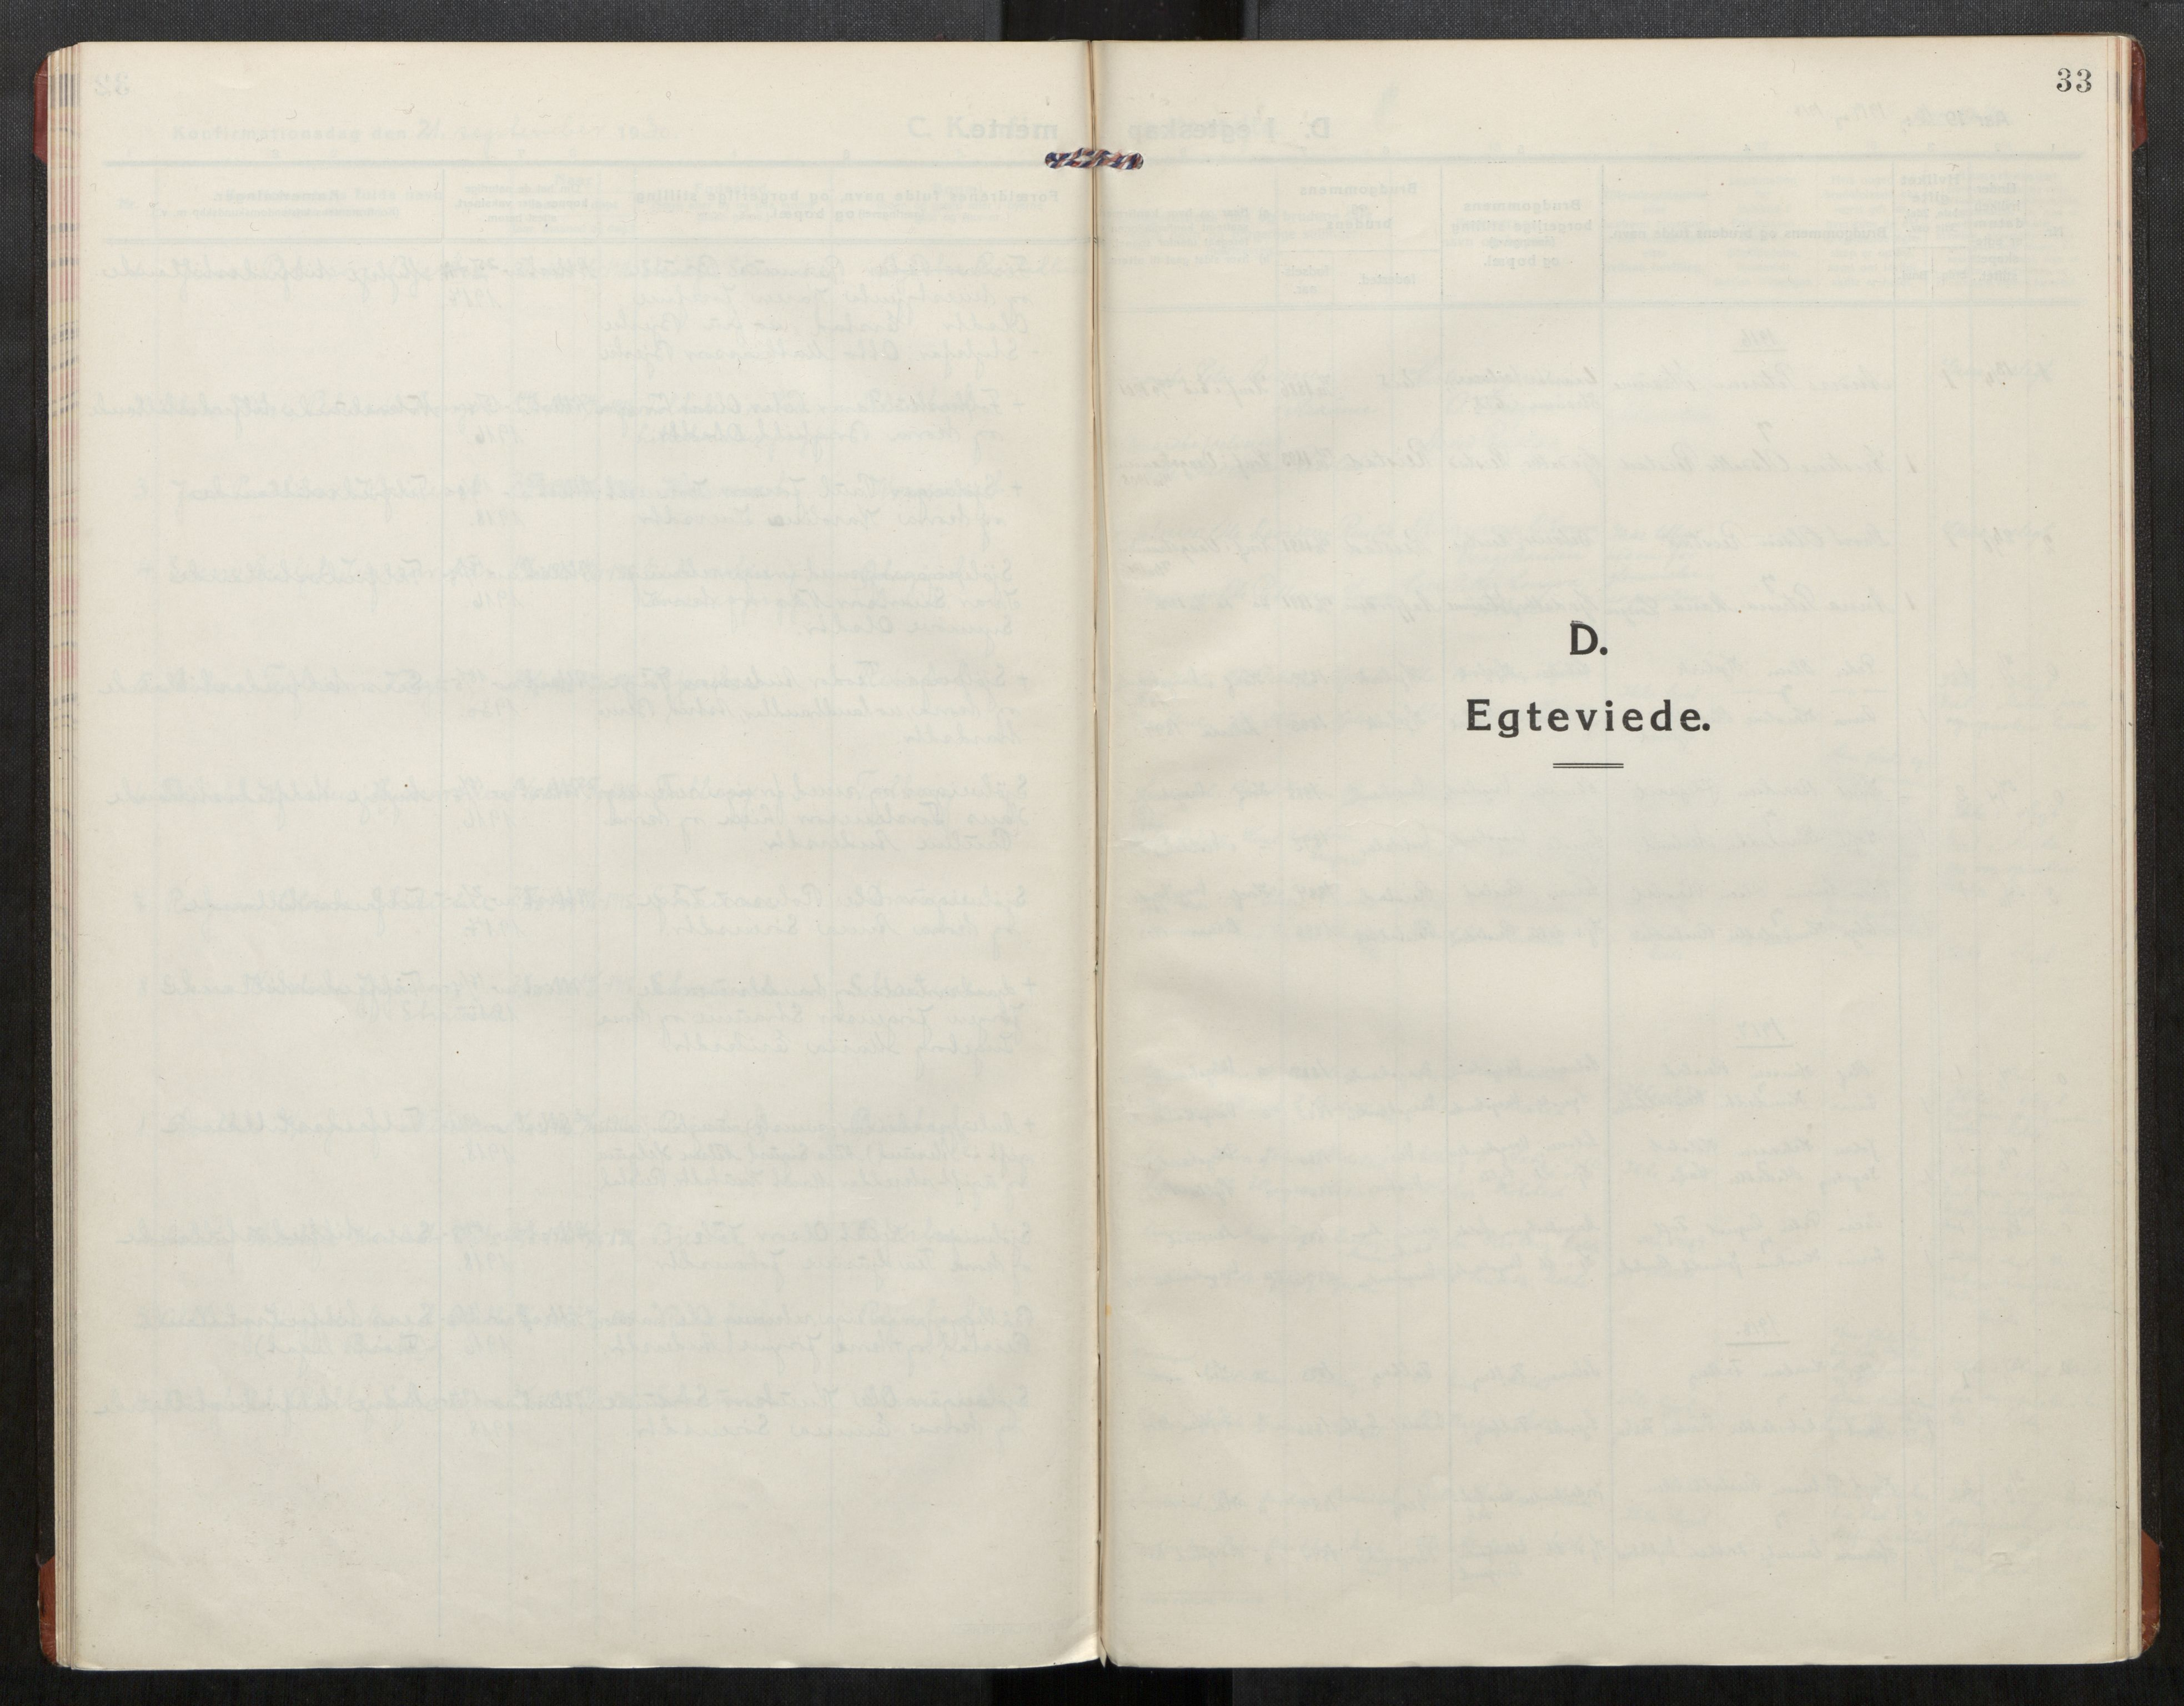 SAT, Grytten sokneprestkontor, Ministerialbok nr. 550A02, 1916-1931, s. 33